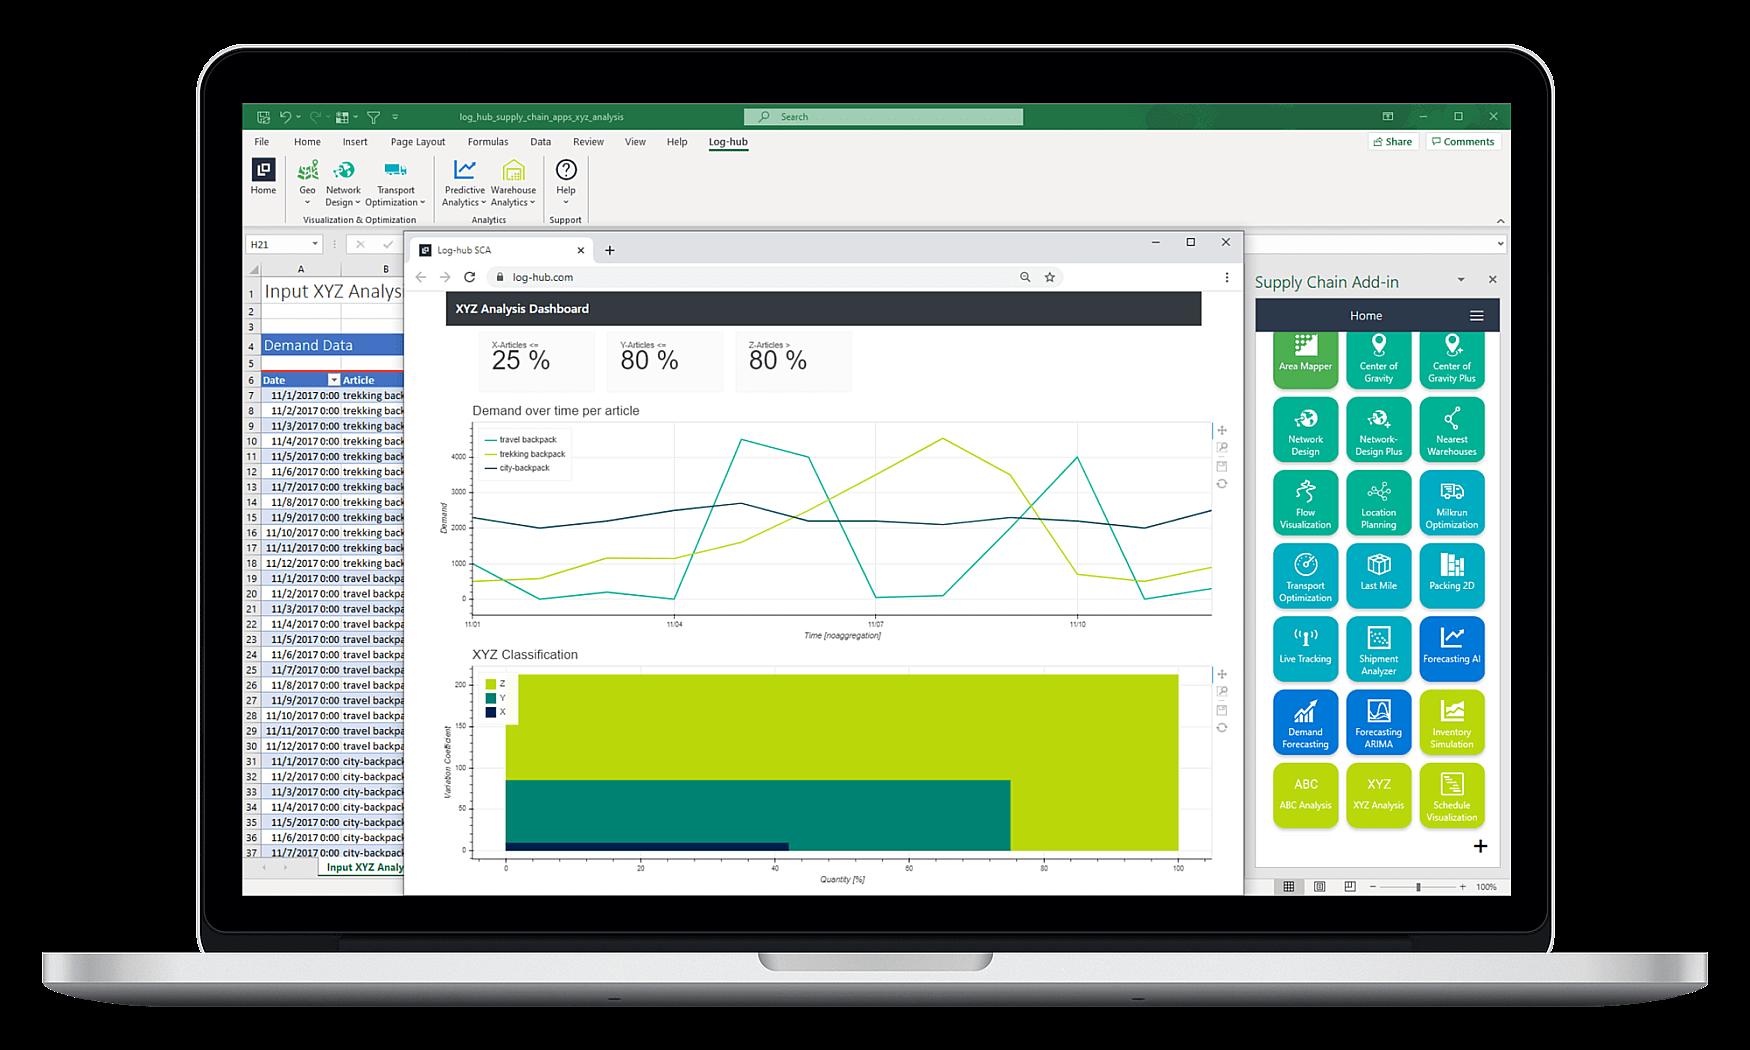 Log-hub Supply Chain Apps, XYZ Analysis